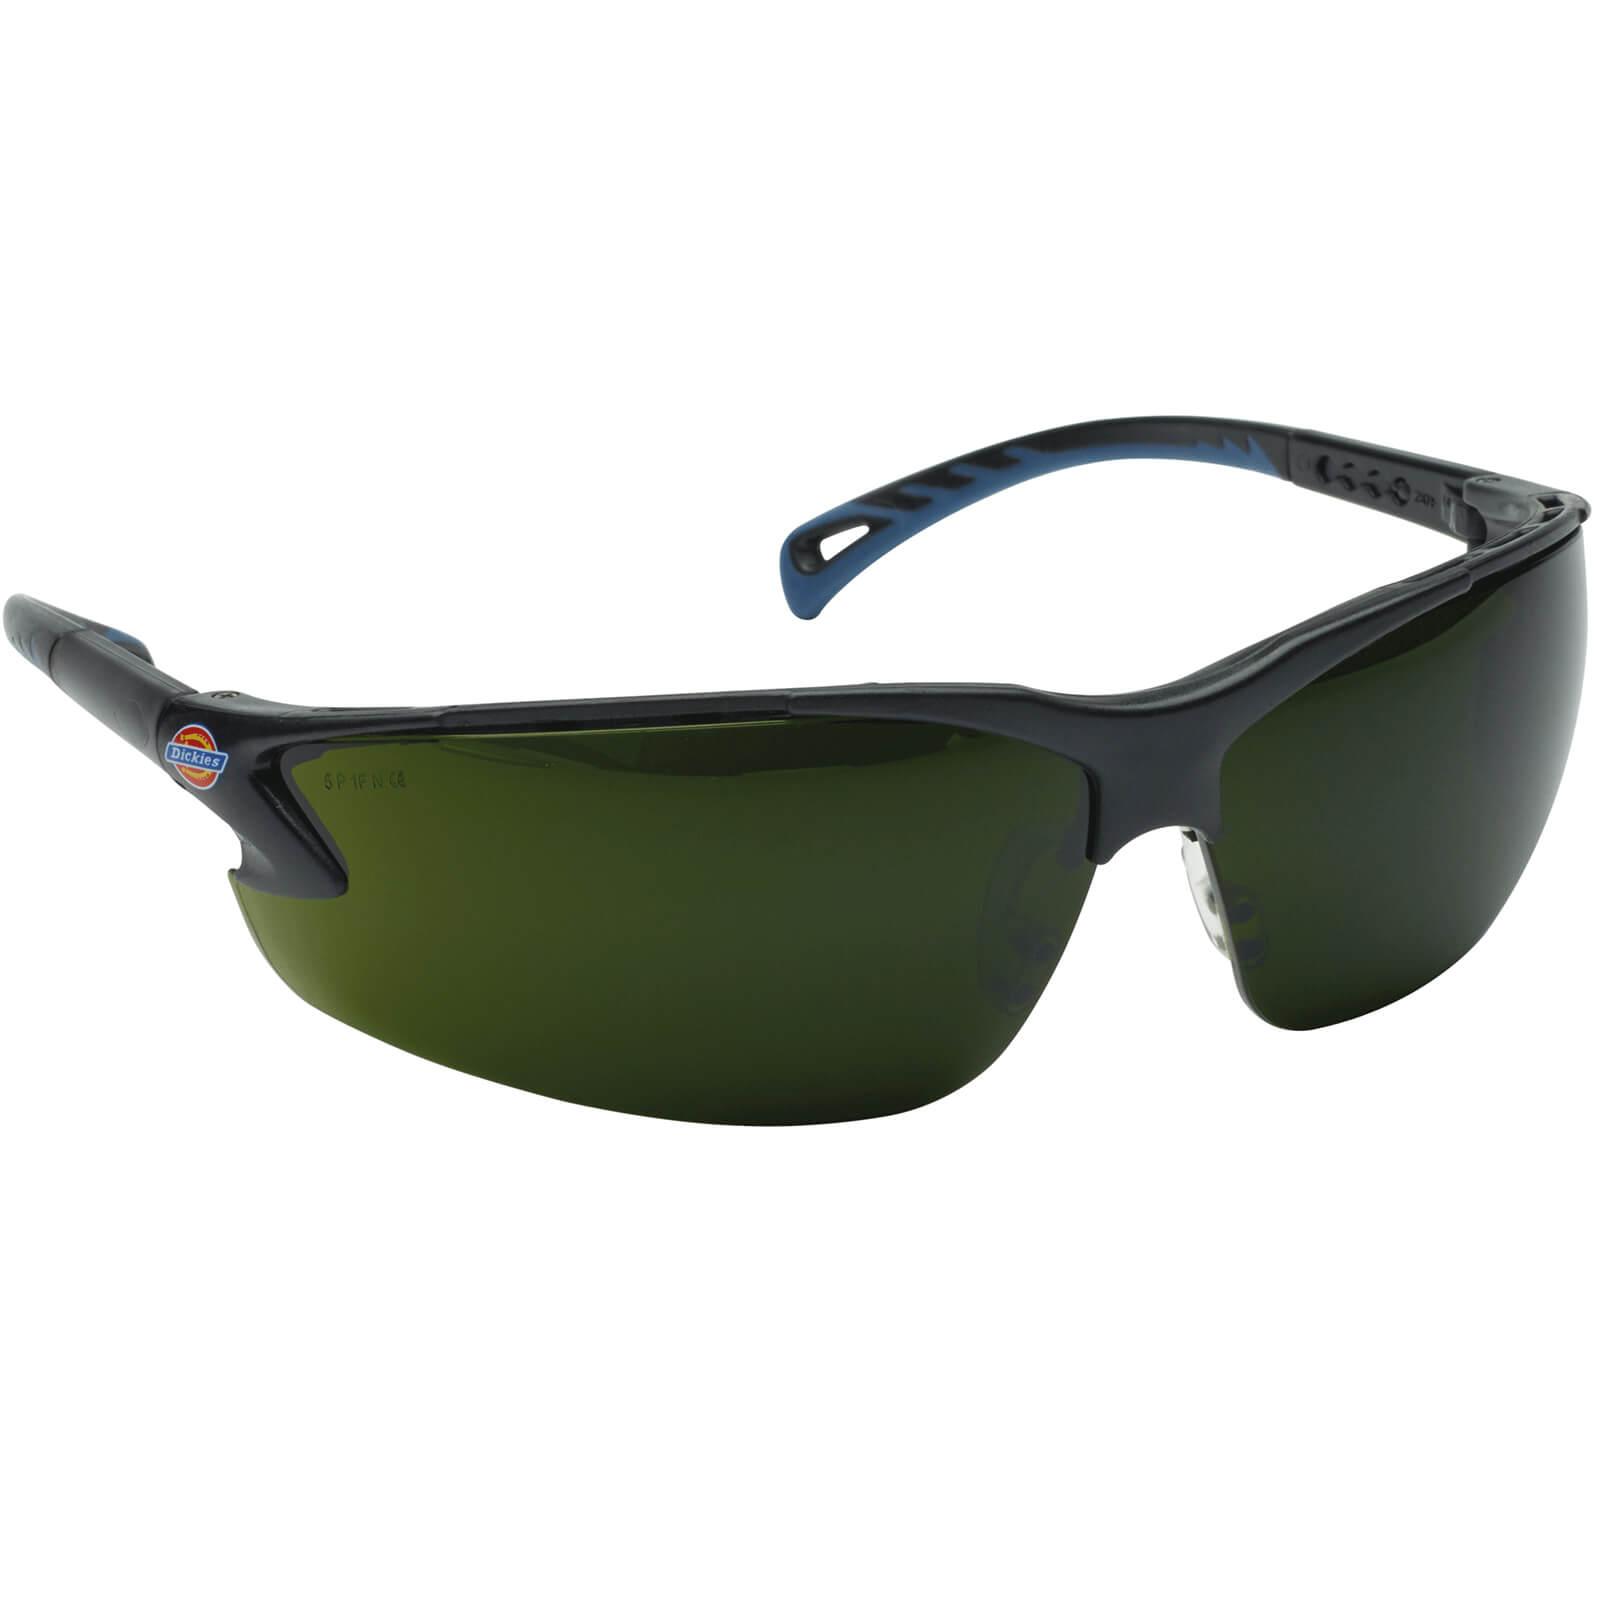 Photo of Dickies enhanced contrast welders safety glasses